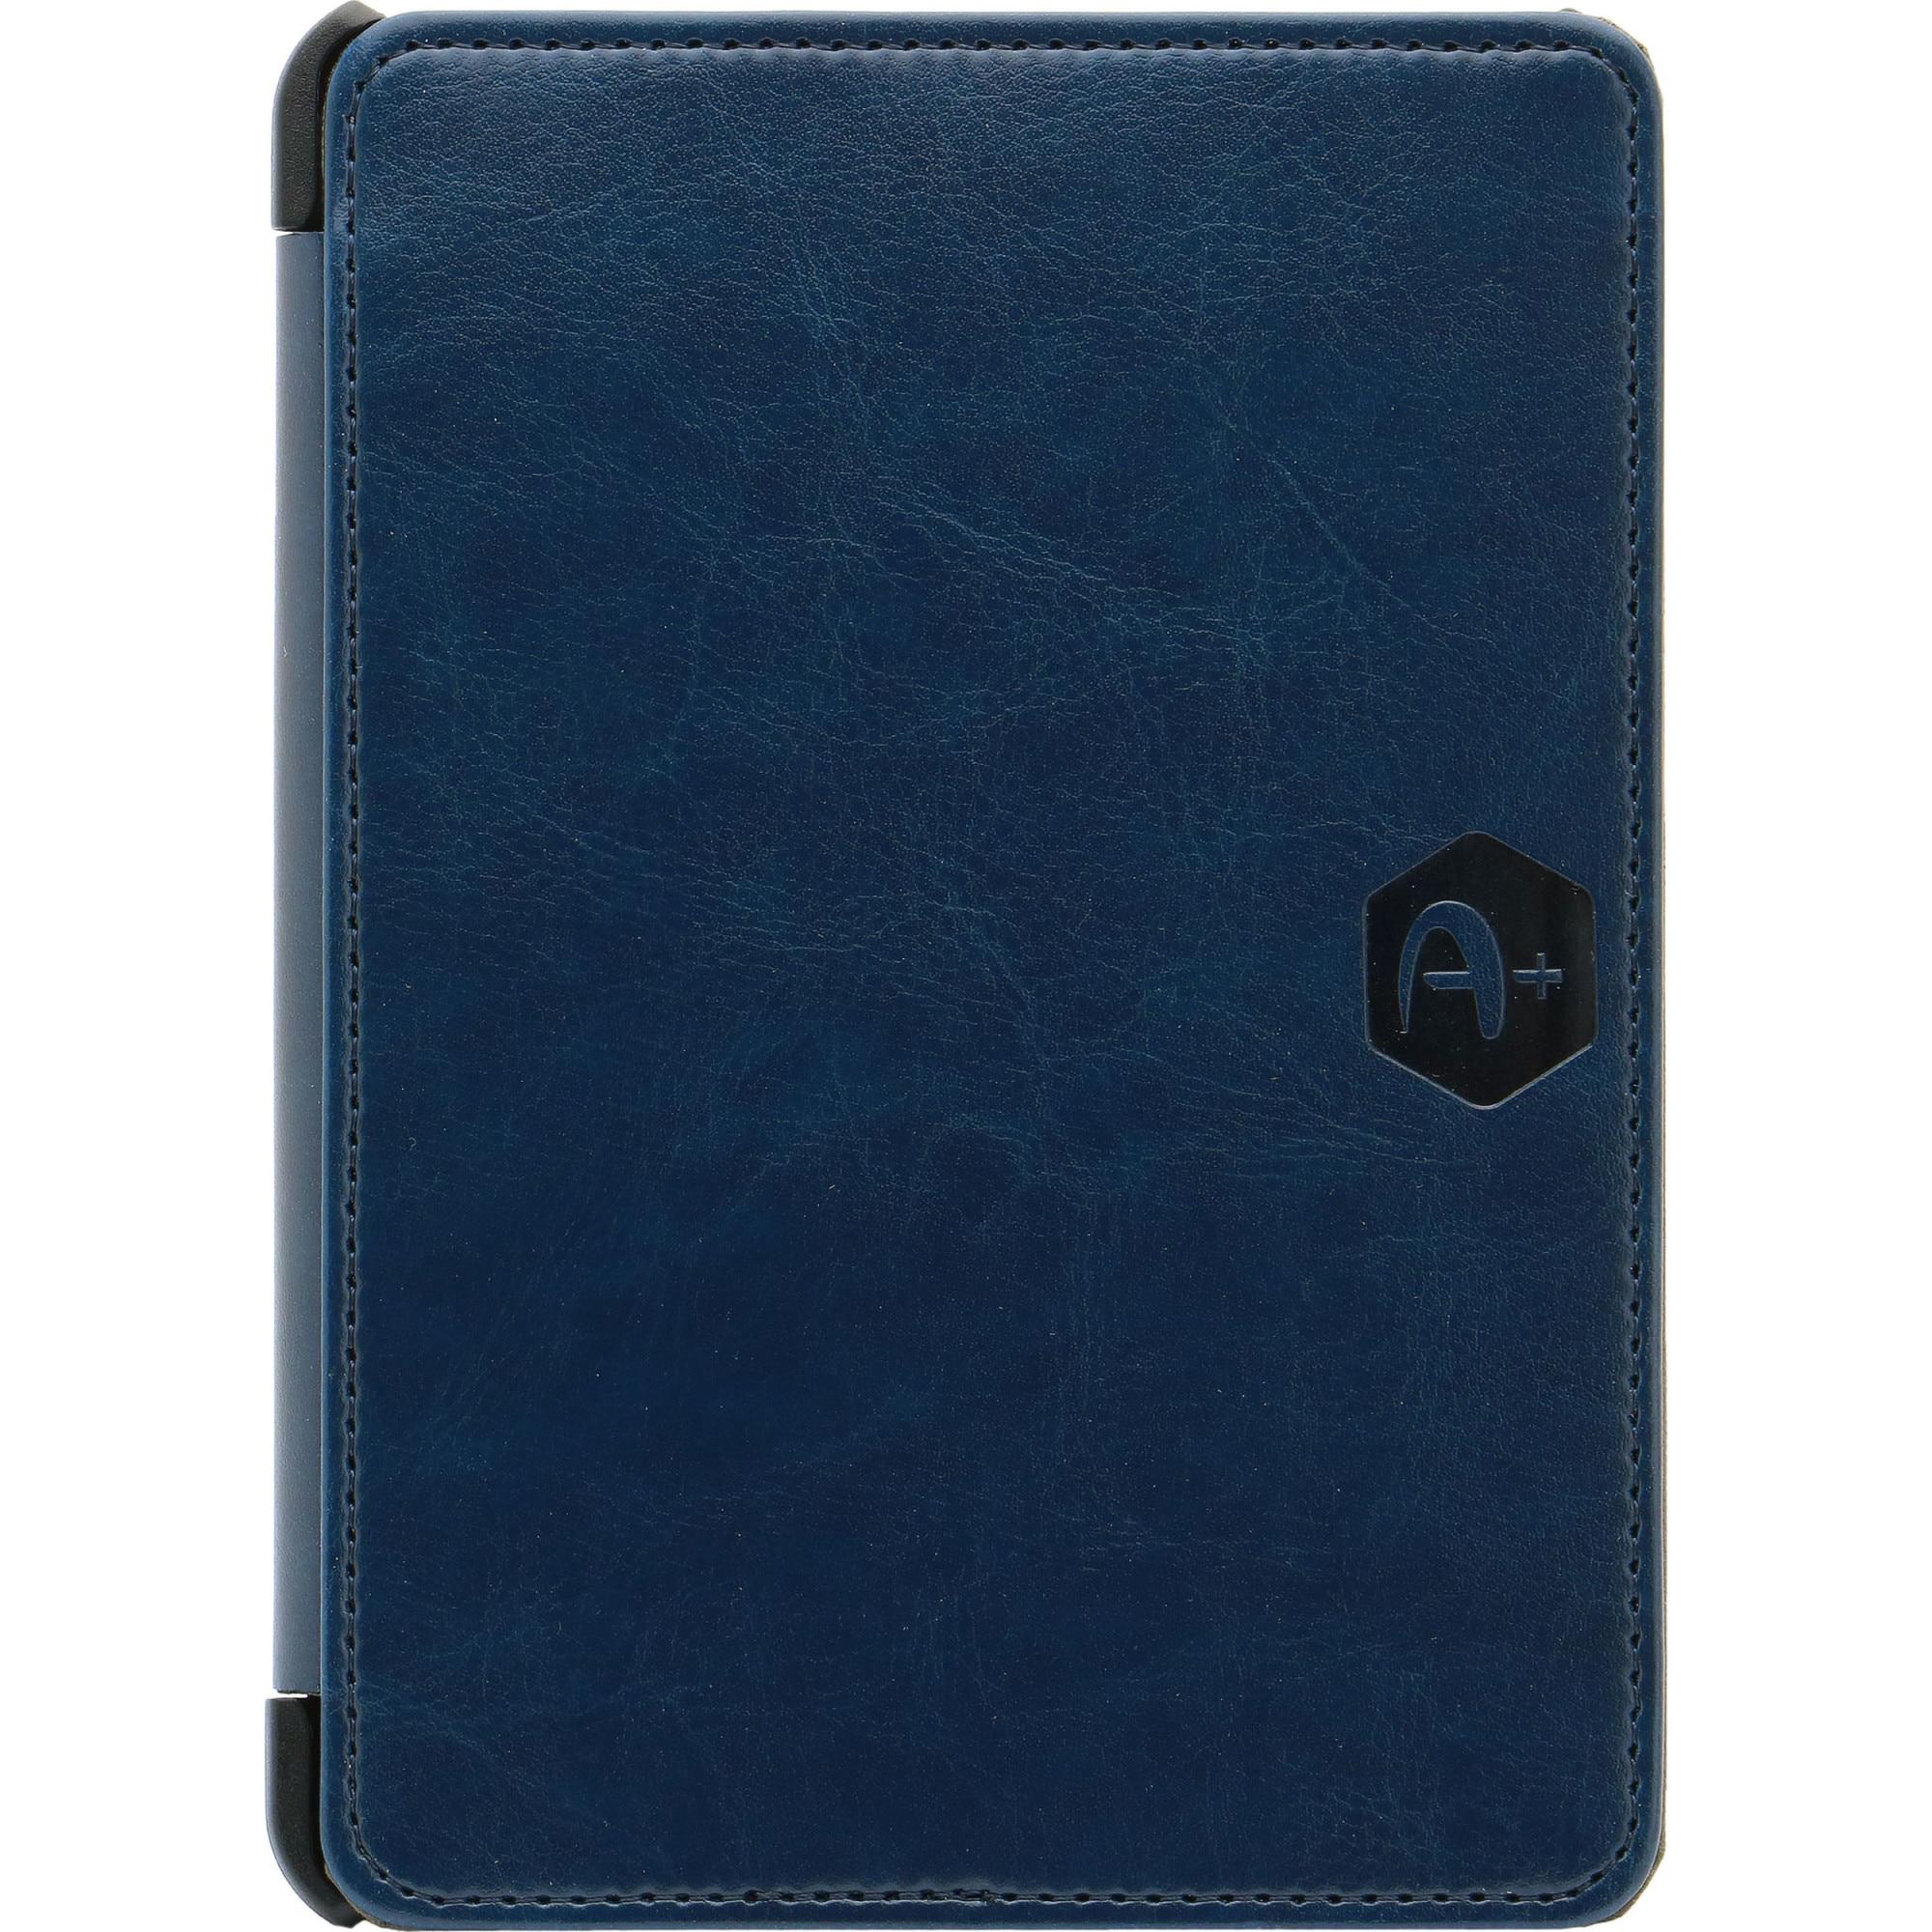 Fotografie Husa de protectie A+ Slim pentru Kindle Paperwhite 4 (10th Generation-2018), Hand blue